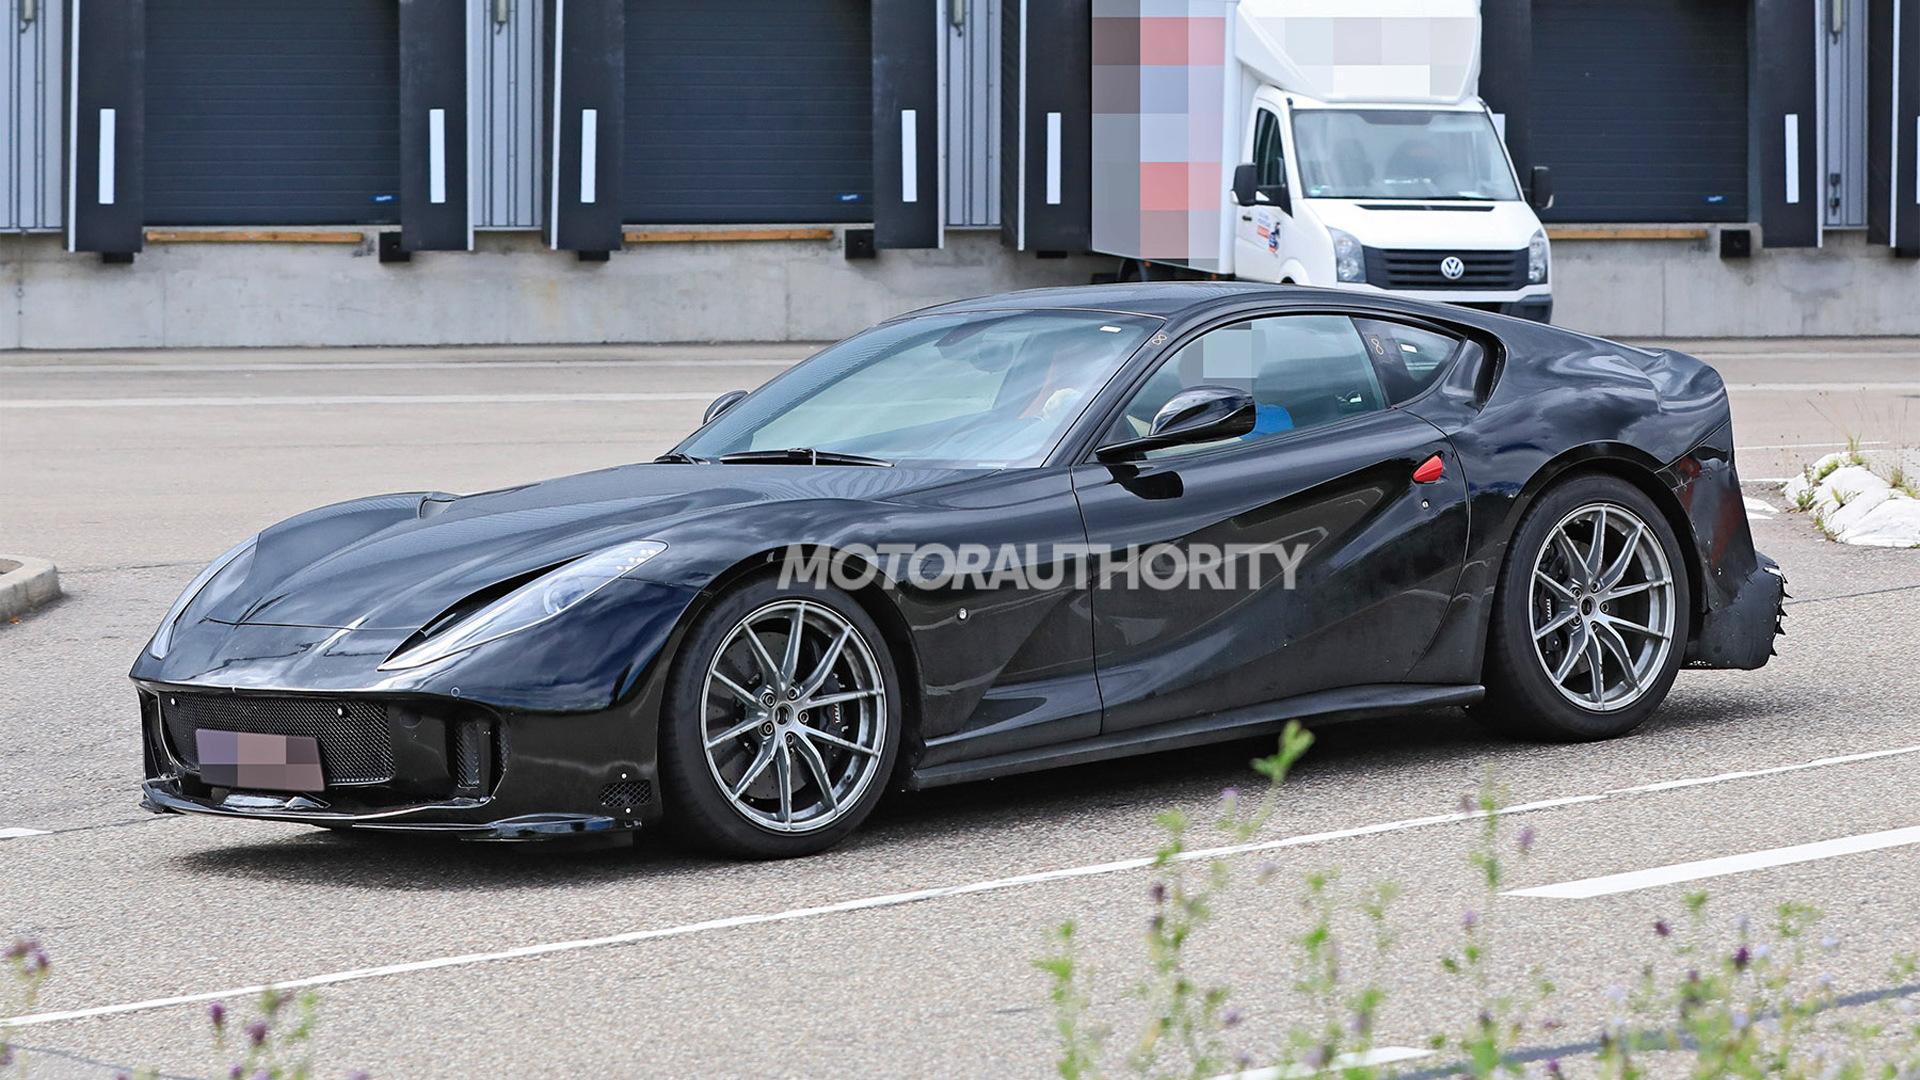 2022 Ferrari 812 GTO spy shots - Picture credit:S. Baldauf/SB-Medien